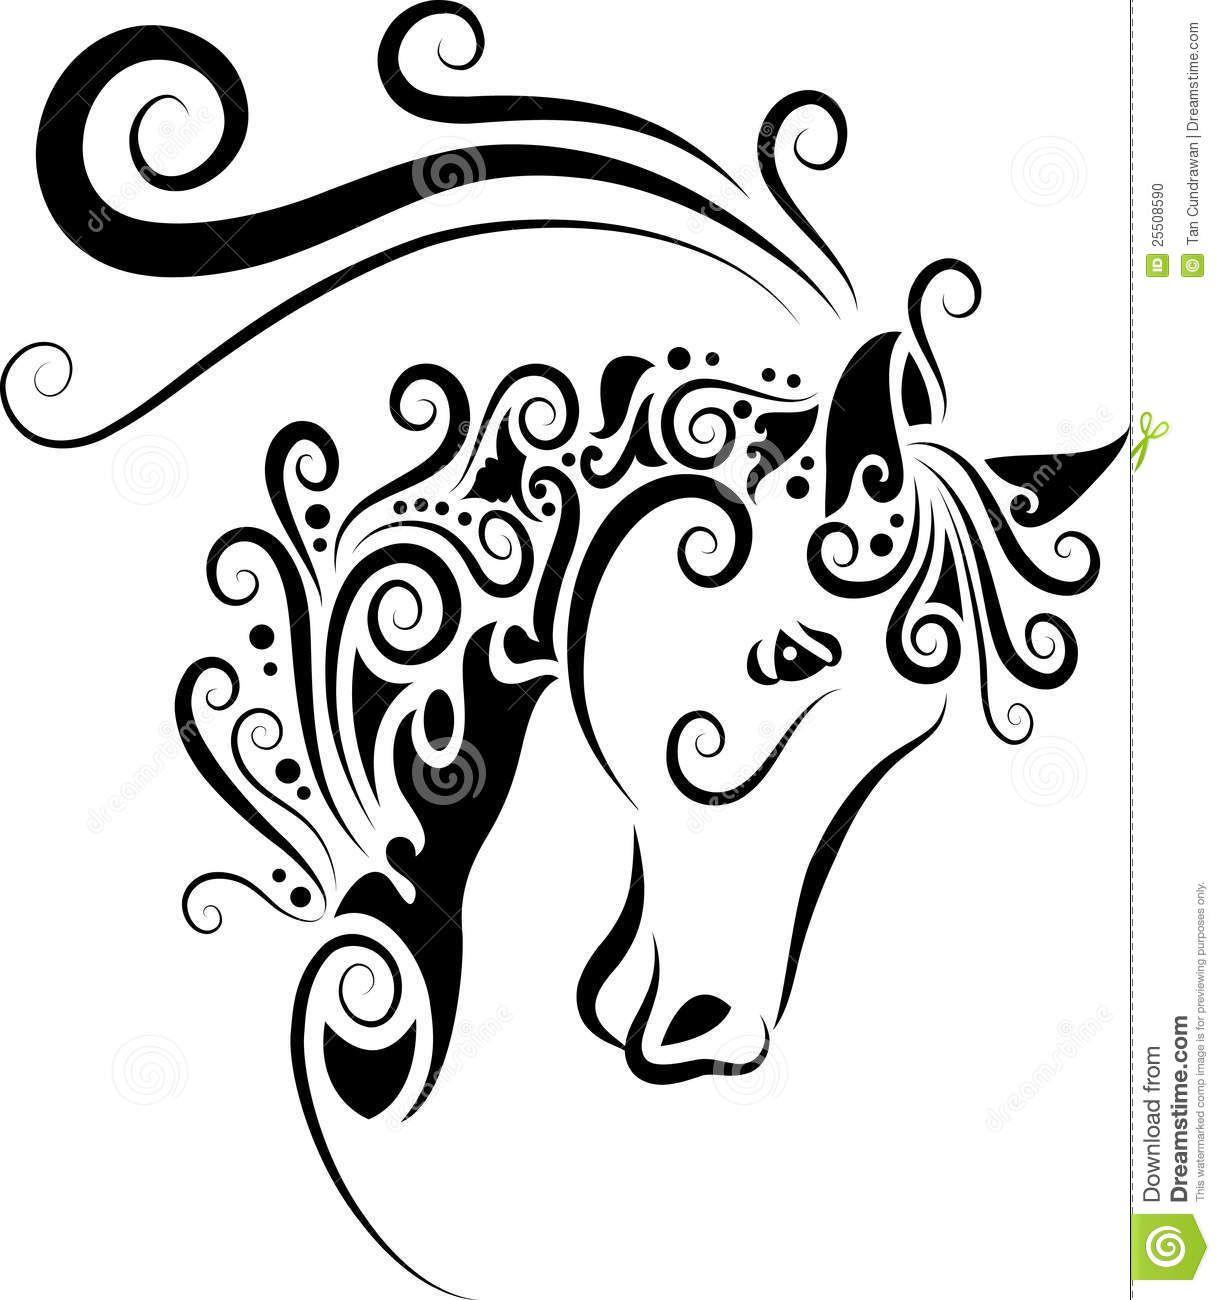 horse stencil pumpkin stencil uploaded by professional cv horse stencil pumpkin stencil uploaded by professional cv writer co